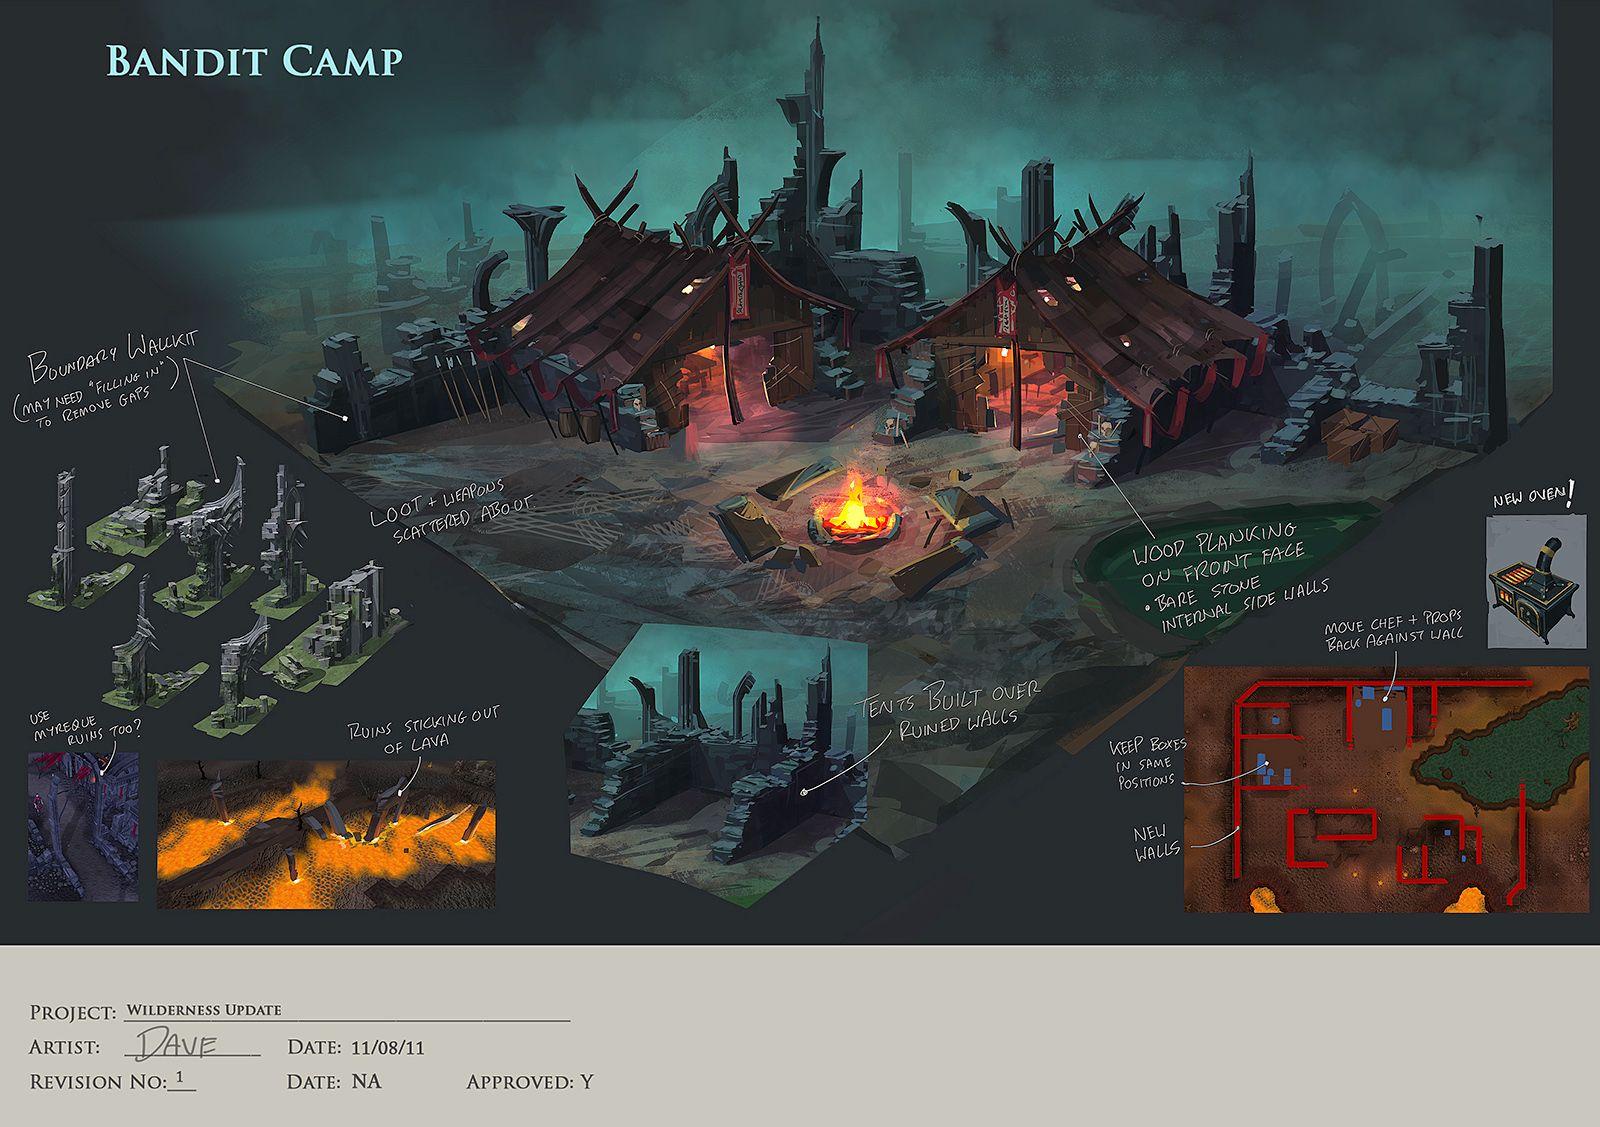 Fantasy Art Wall Camp Got